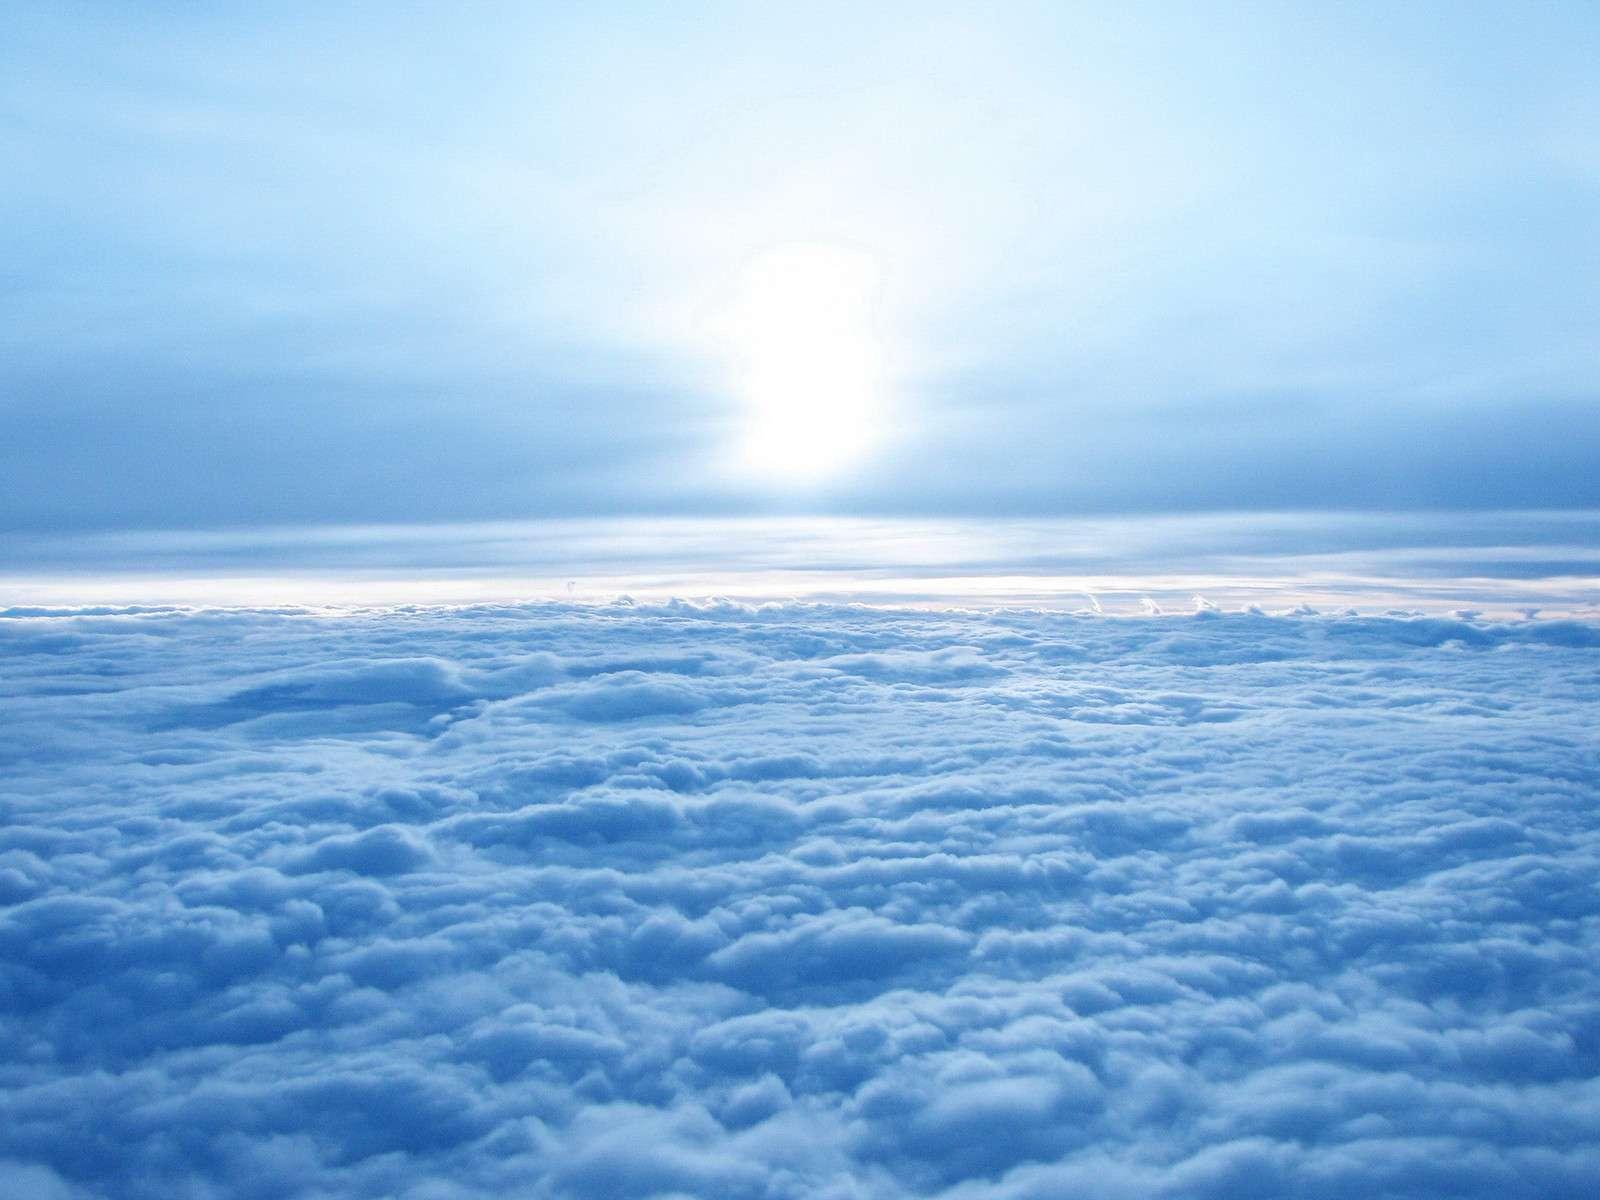 http://4.bp.blogspot.com/-QdS6weVA5nY/T1LDWoIhy0I/AAAAAAAAB7g/mC9WQMAxHdk/s1600/above-blue-sky-wallpaper.jpg